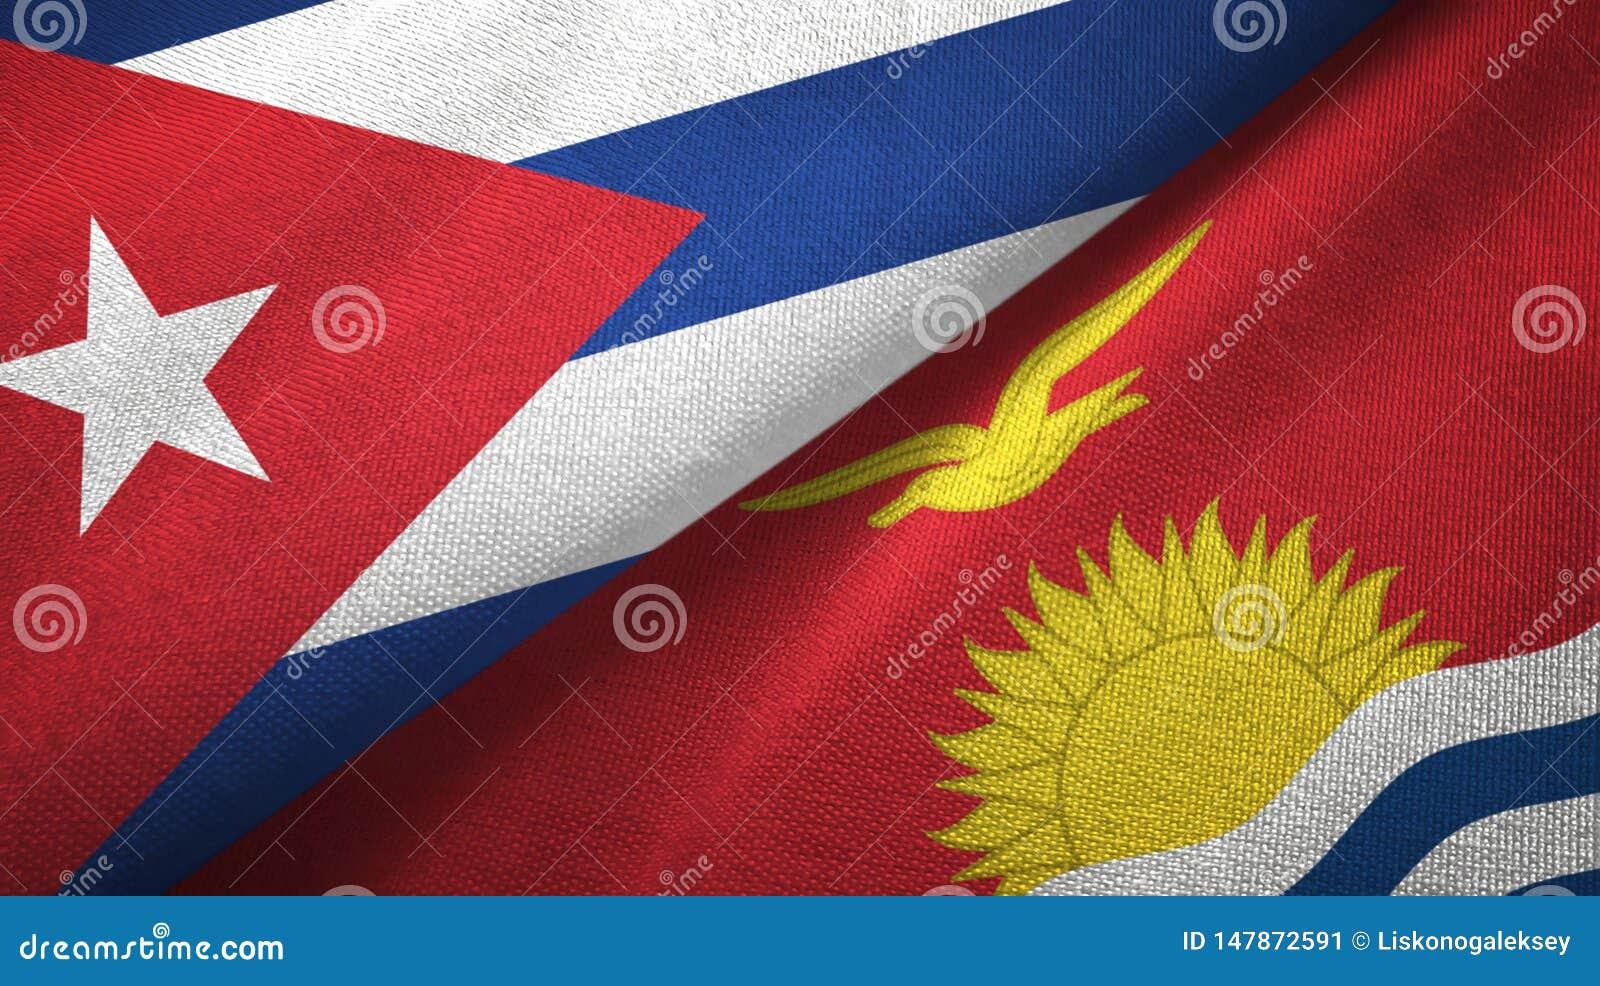 Tissu de textile de drapeaux du Cuba et du Kiribati deux, texture de tissu